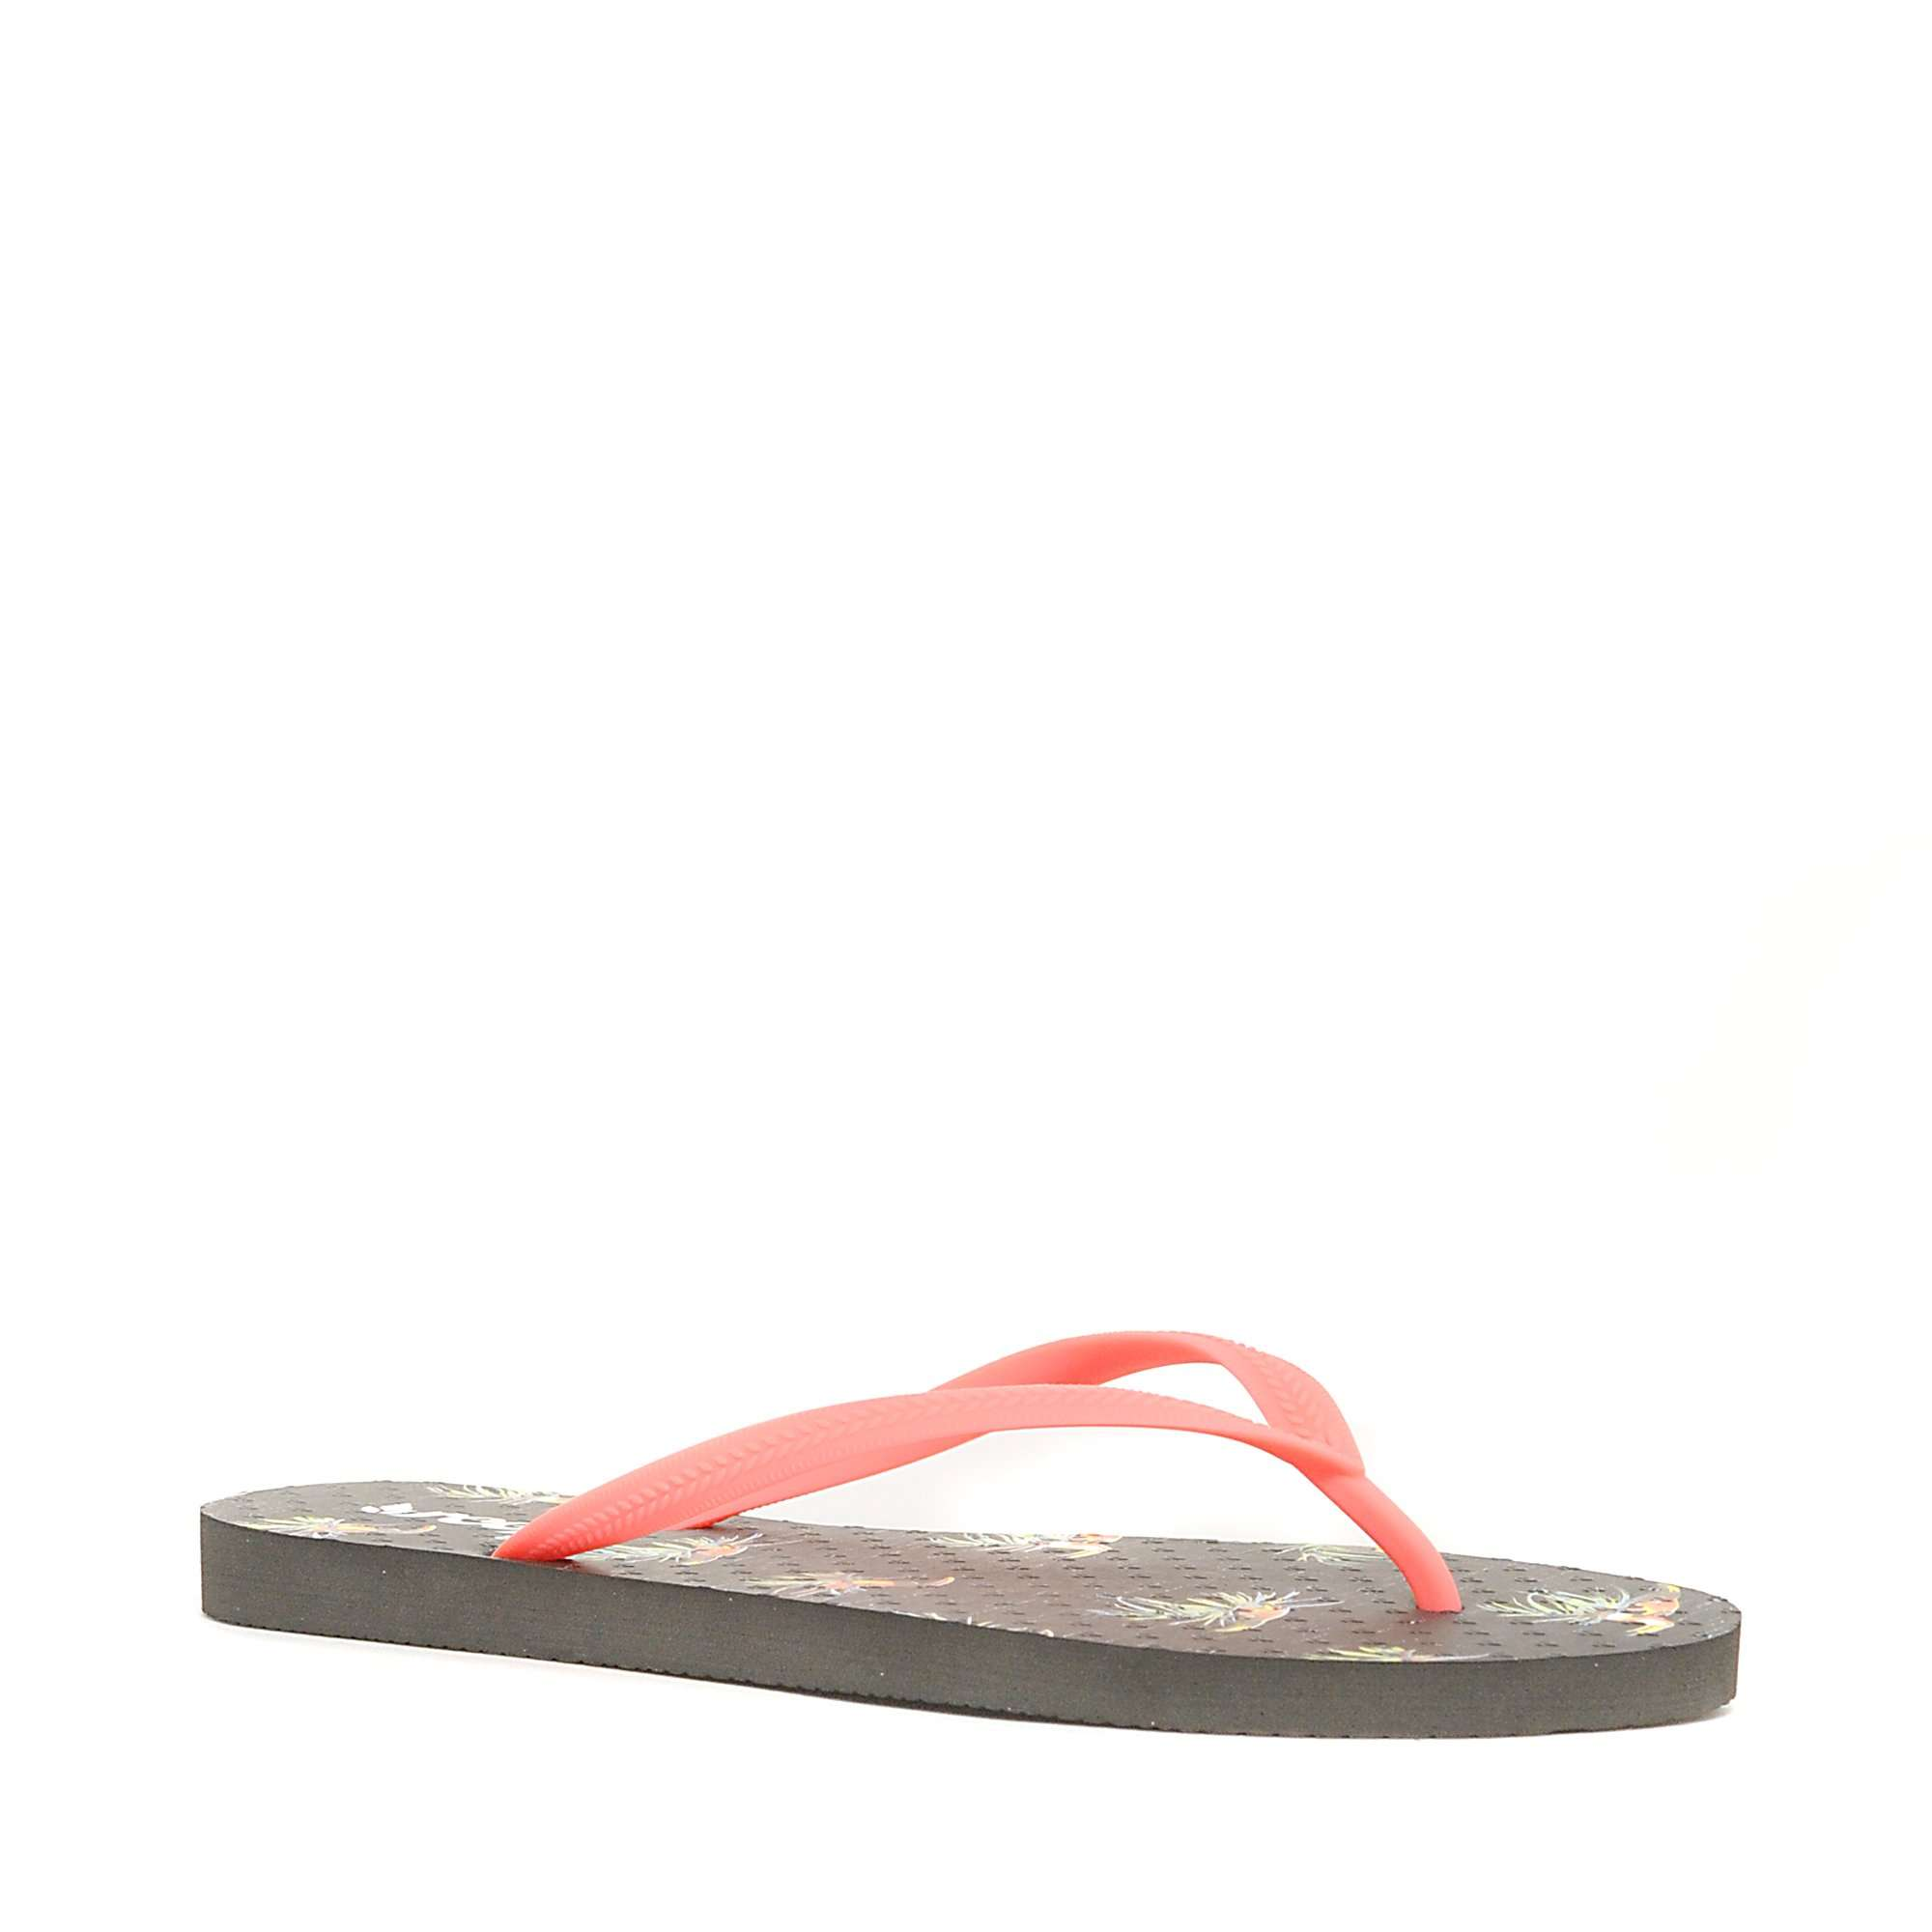 REEF Women's Chakras Print Flip Flops